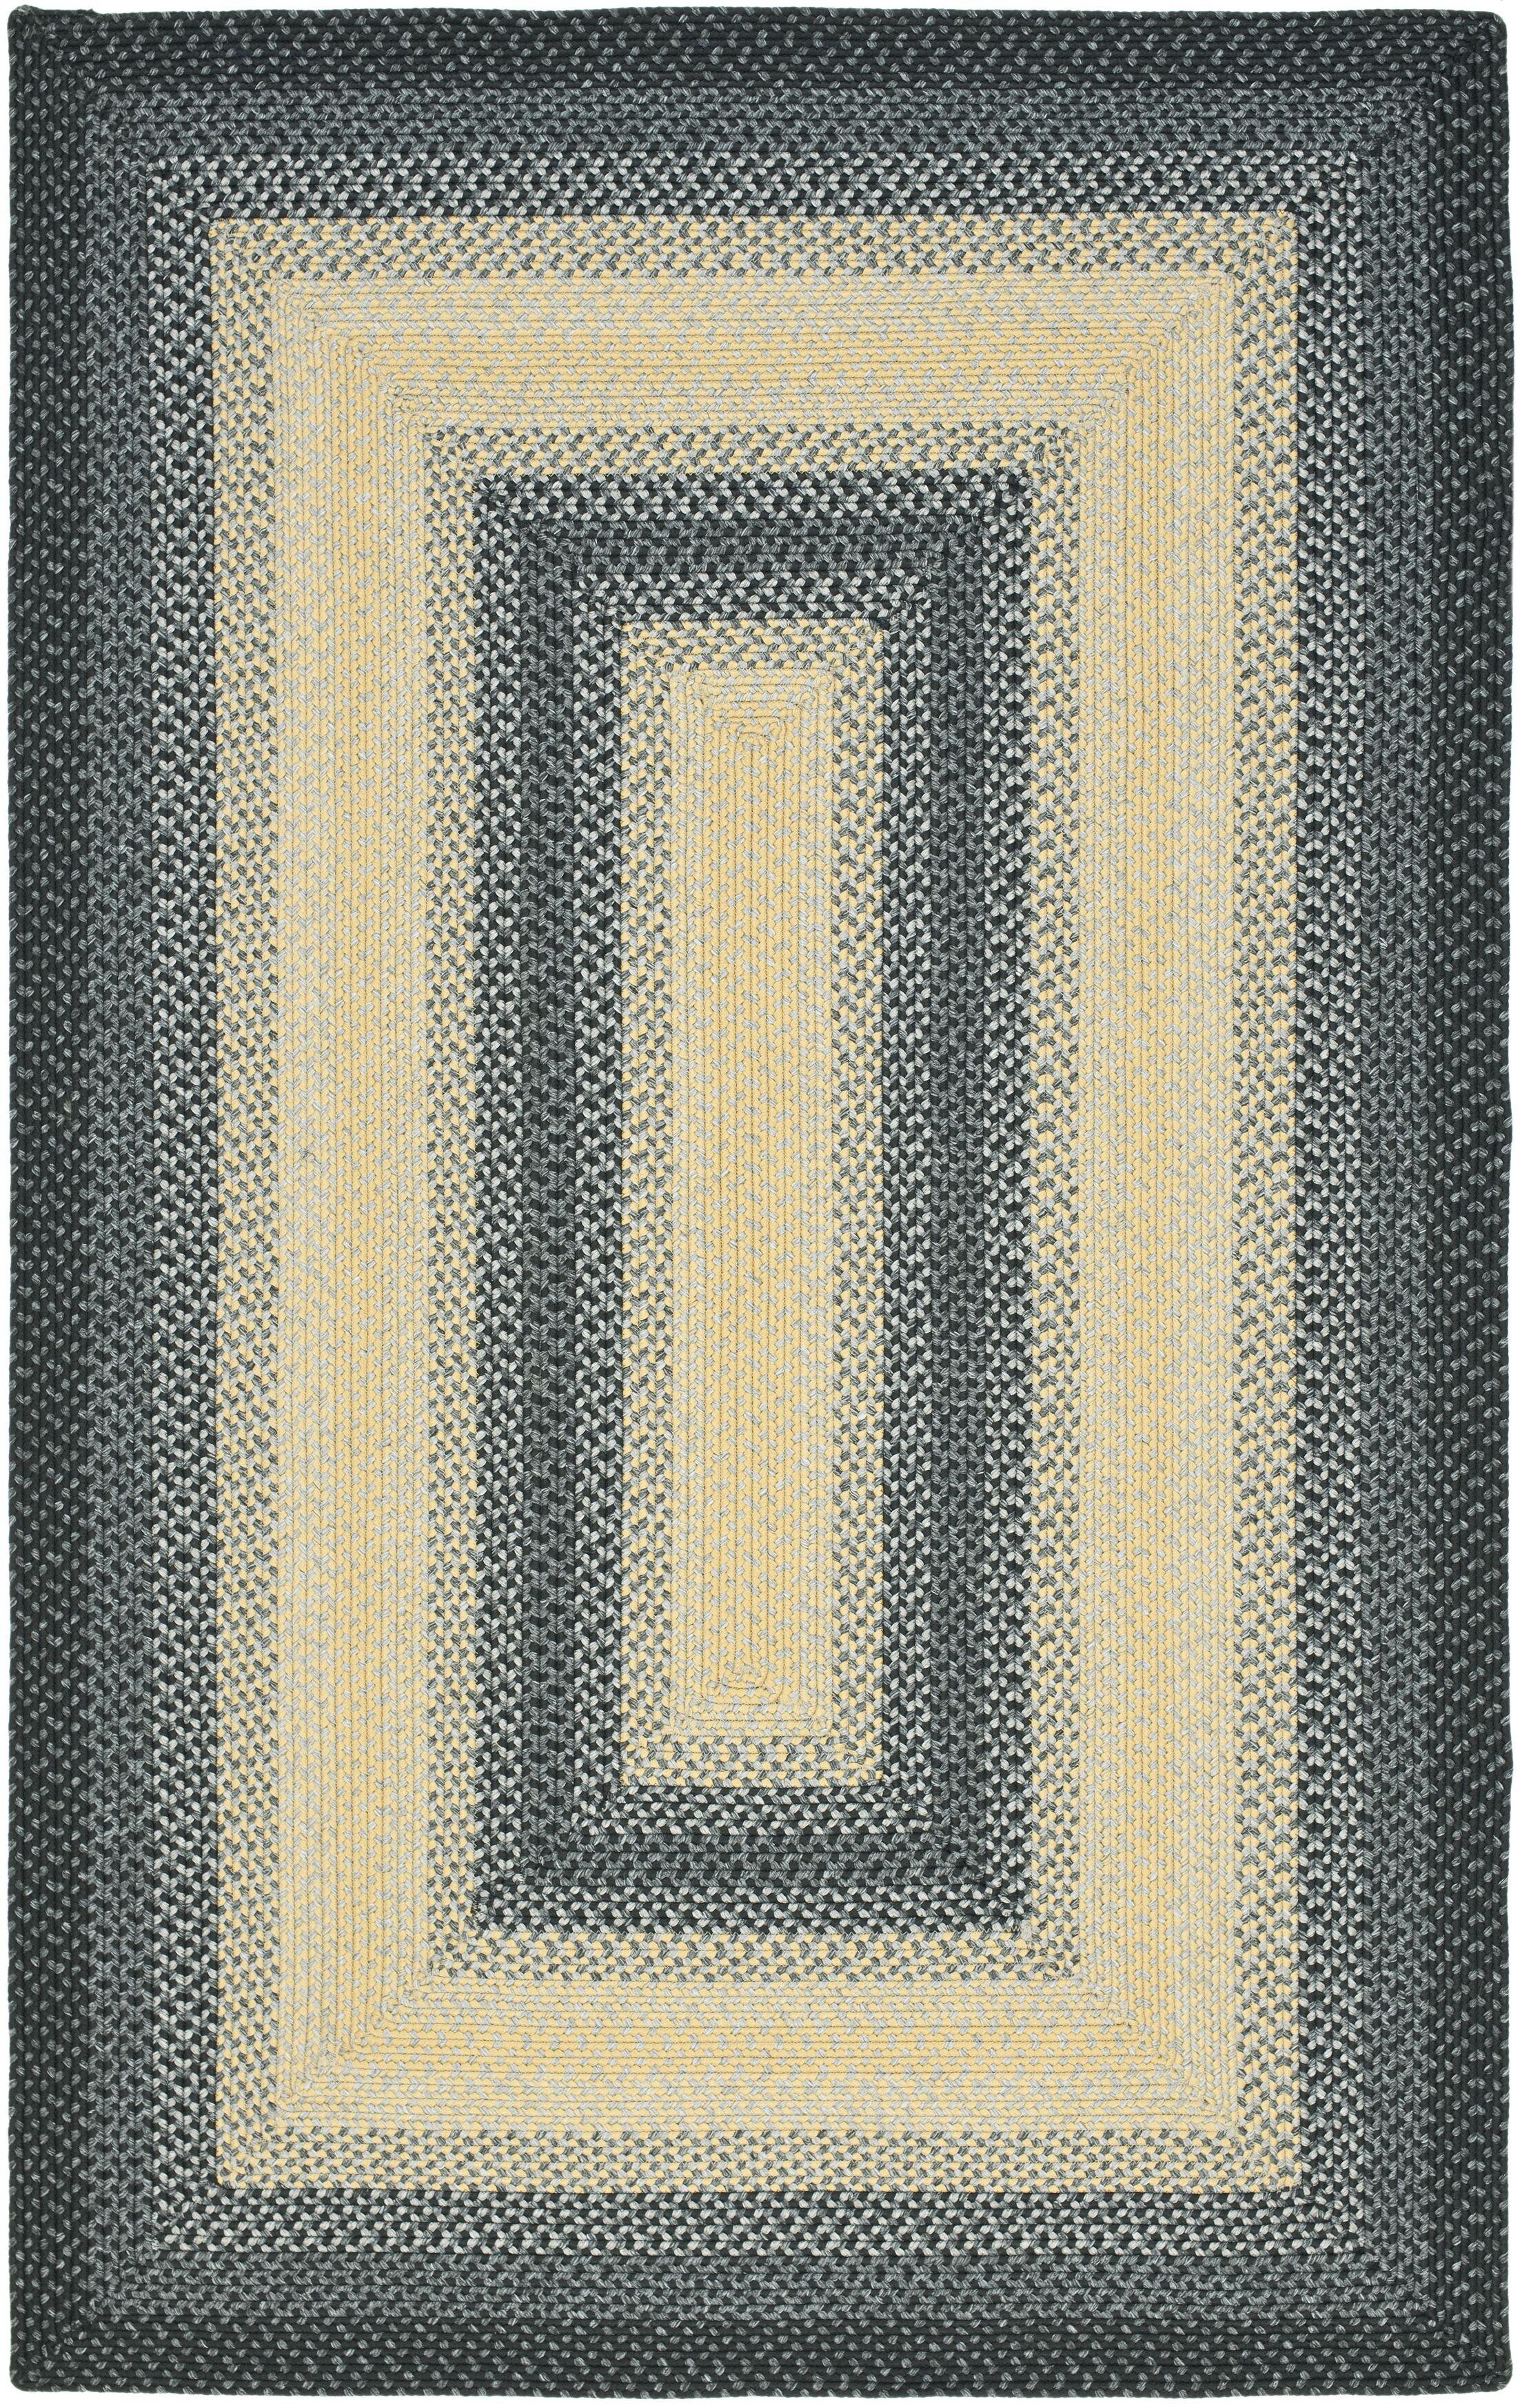 Georgina Hand-Woven Black/Grey Area Rug Rug Size: Rectangle 8' x 10'